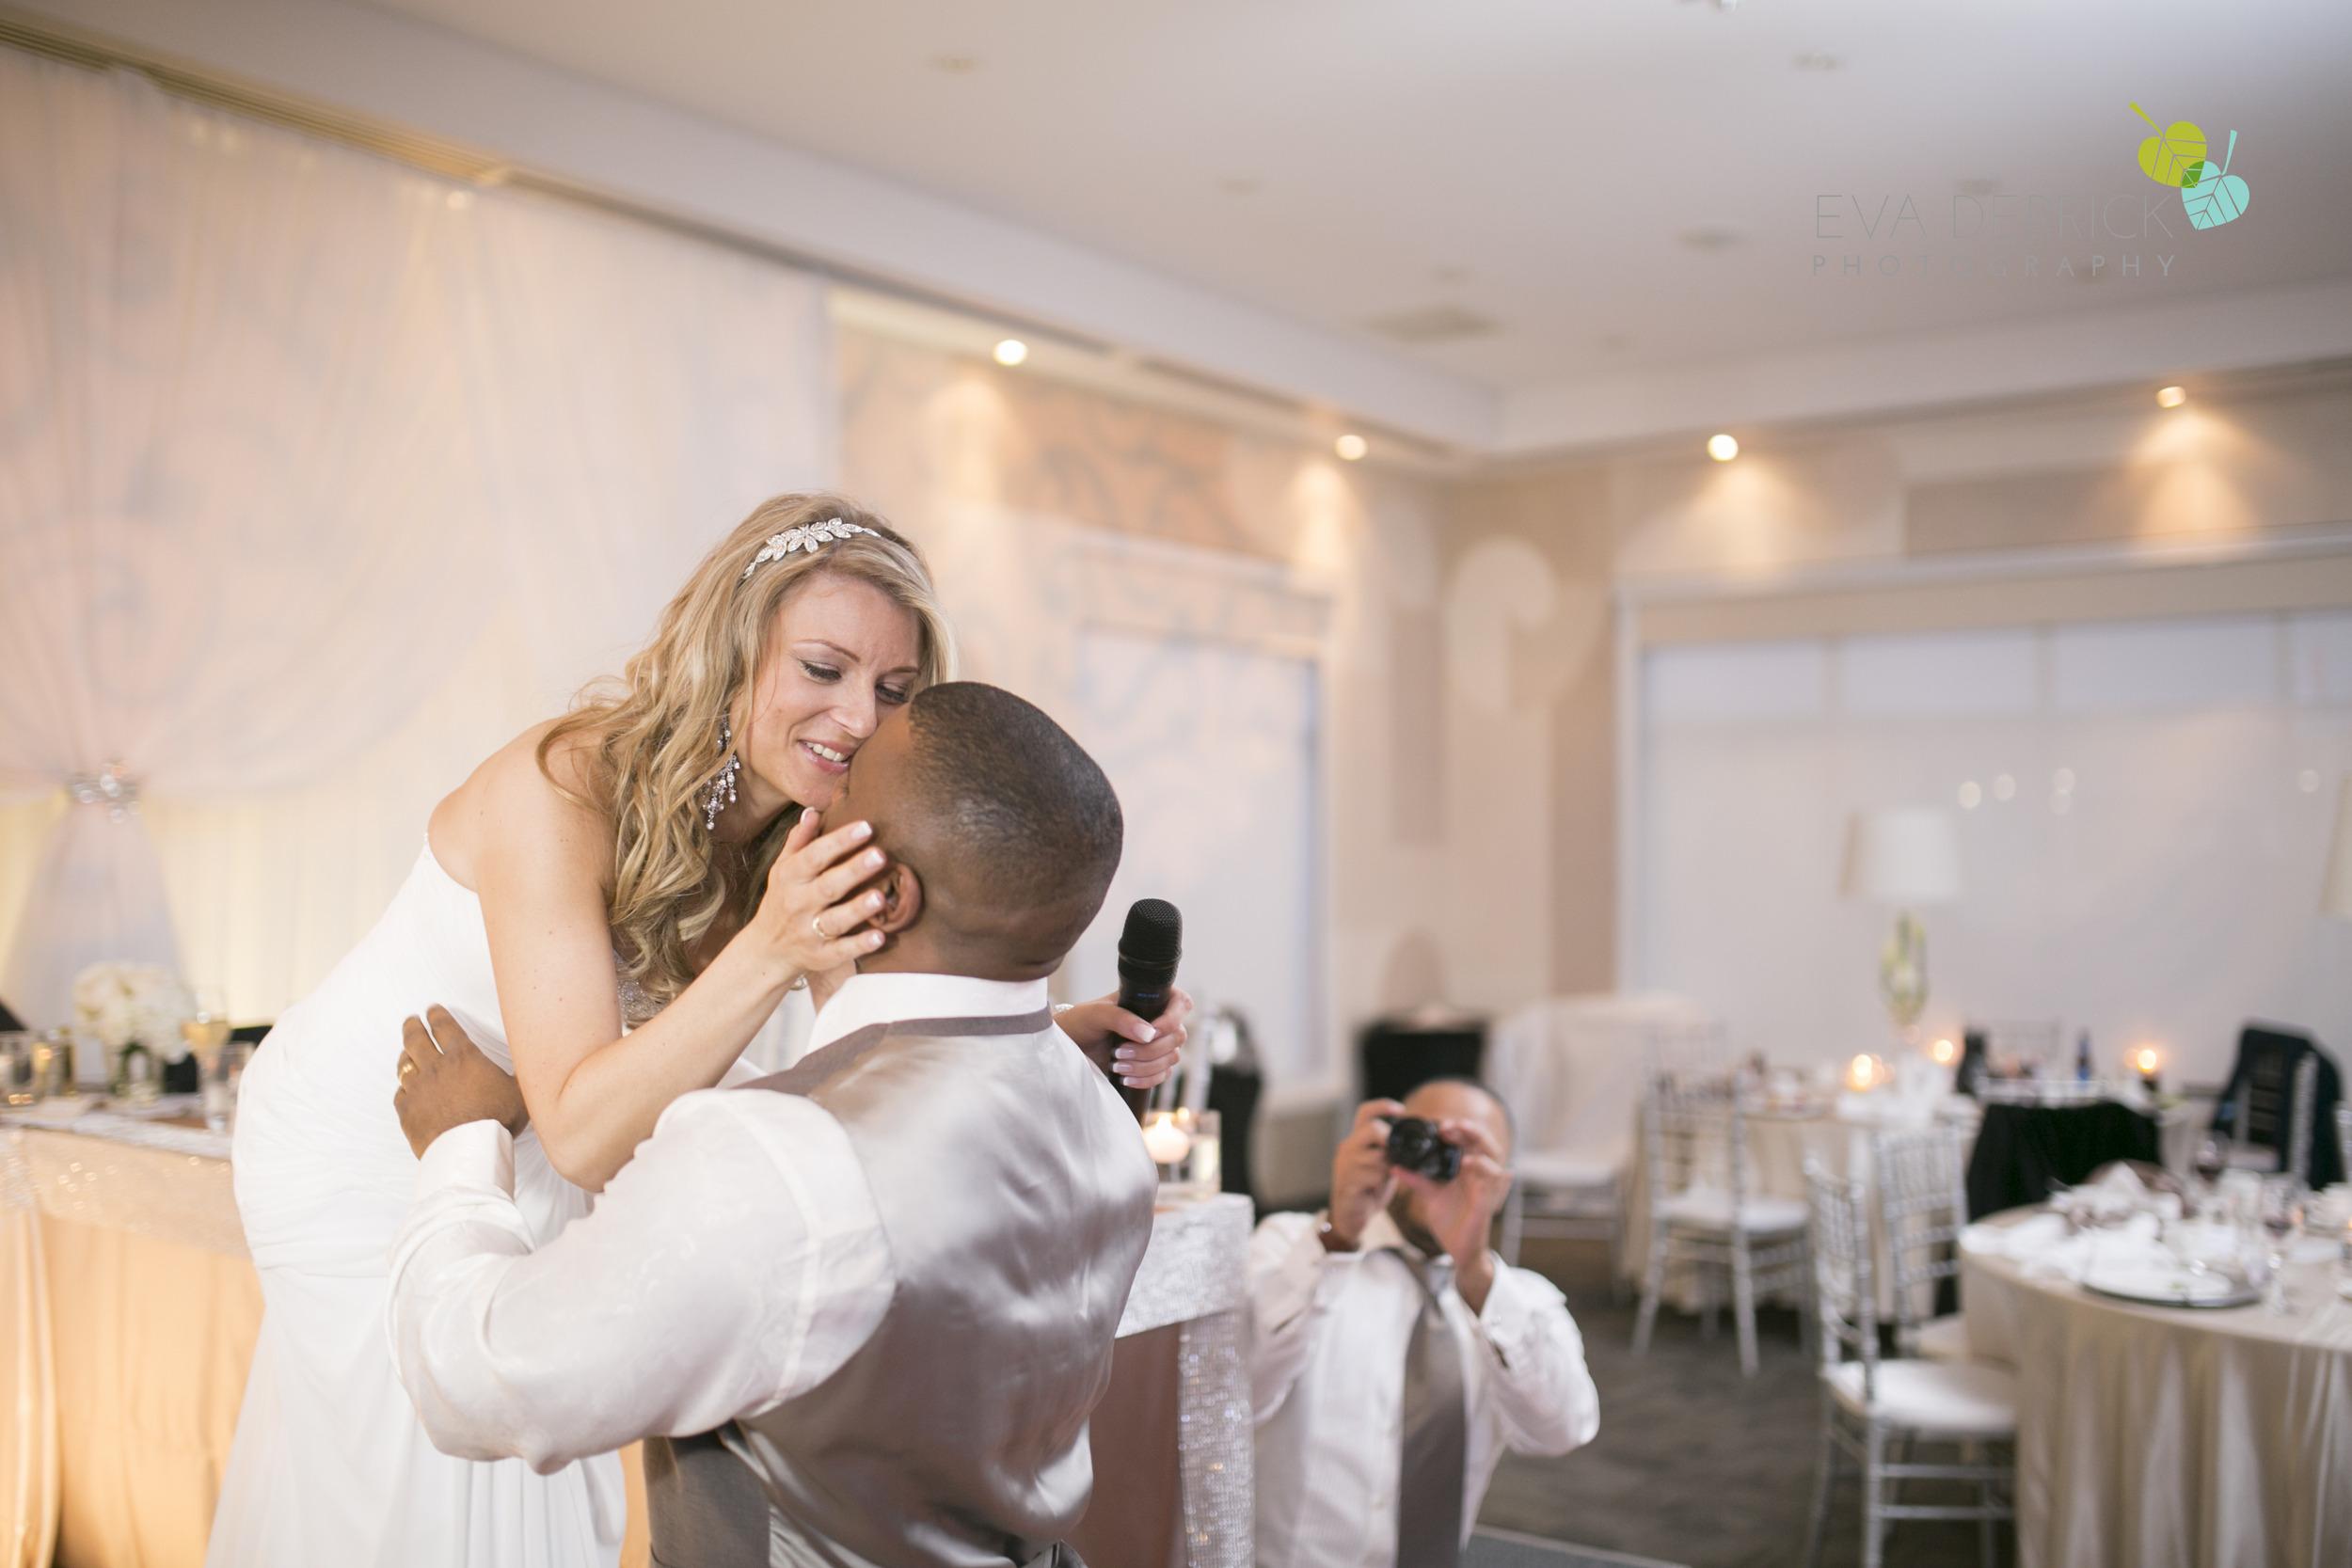 edp_wedding_jenna_chris-0469.jpg